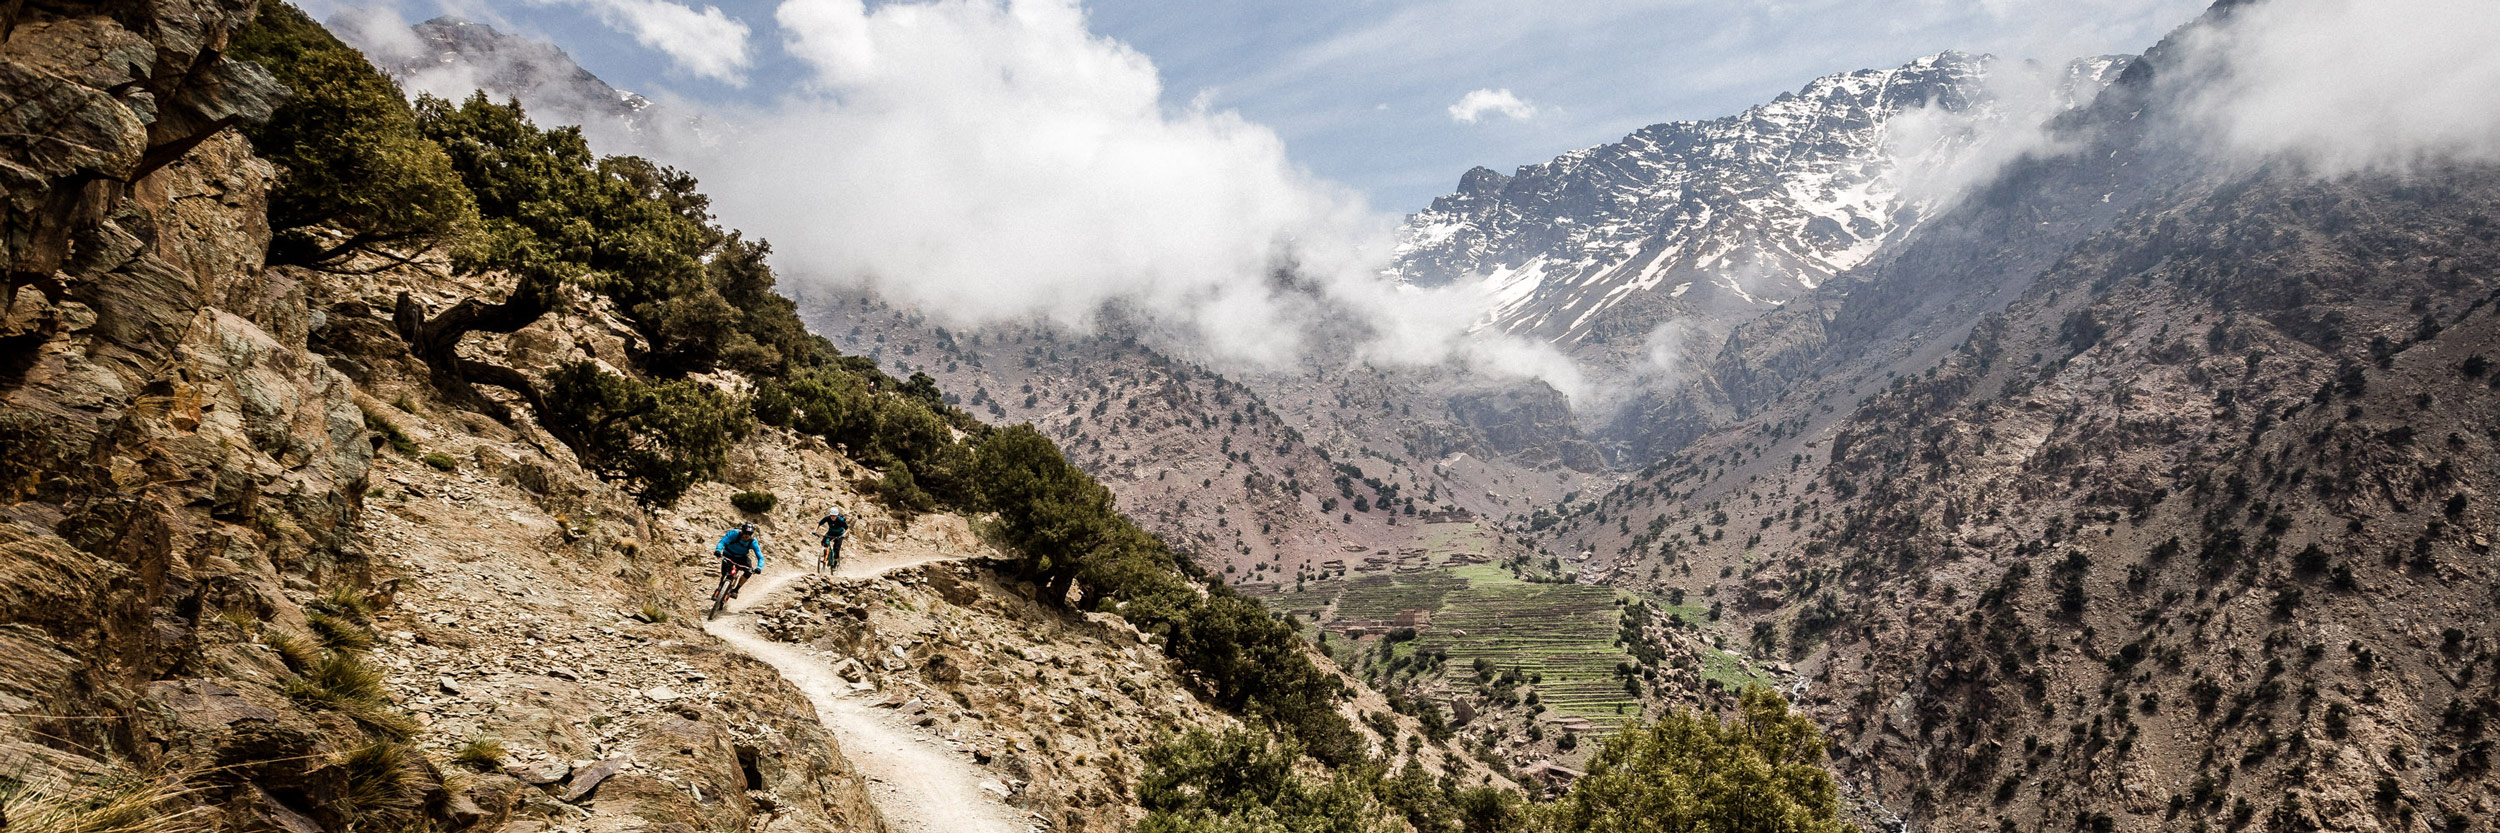 Mountain bike tours worldwide in the Atlas Mountains of Morocco